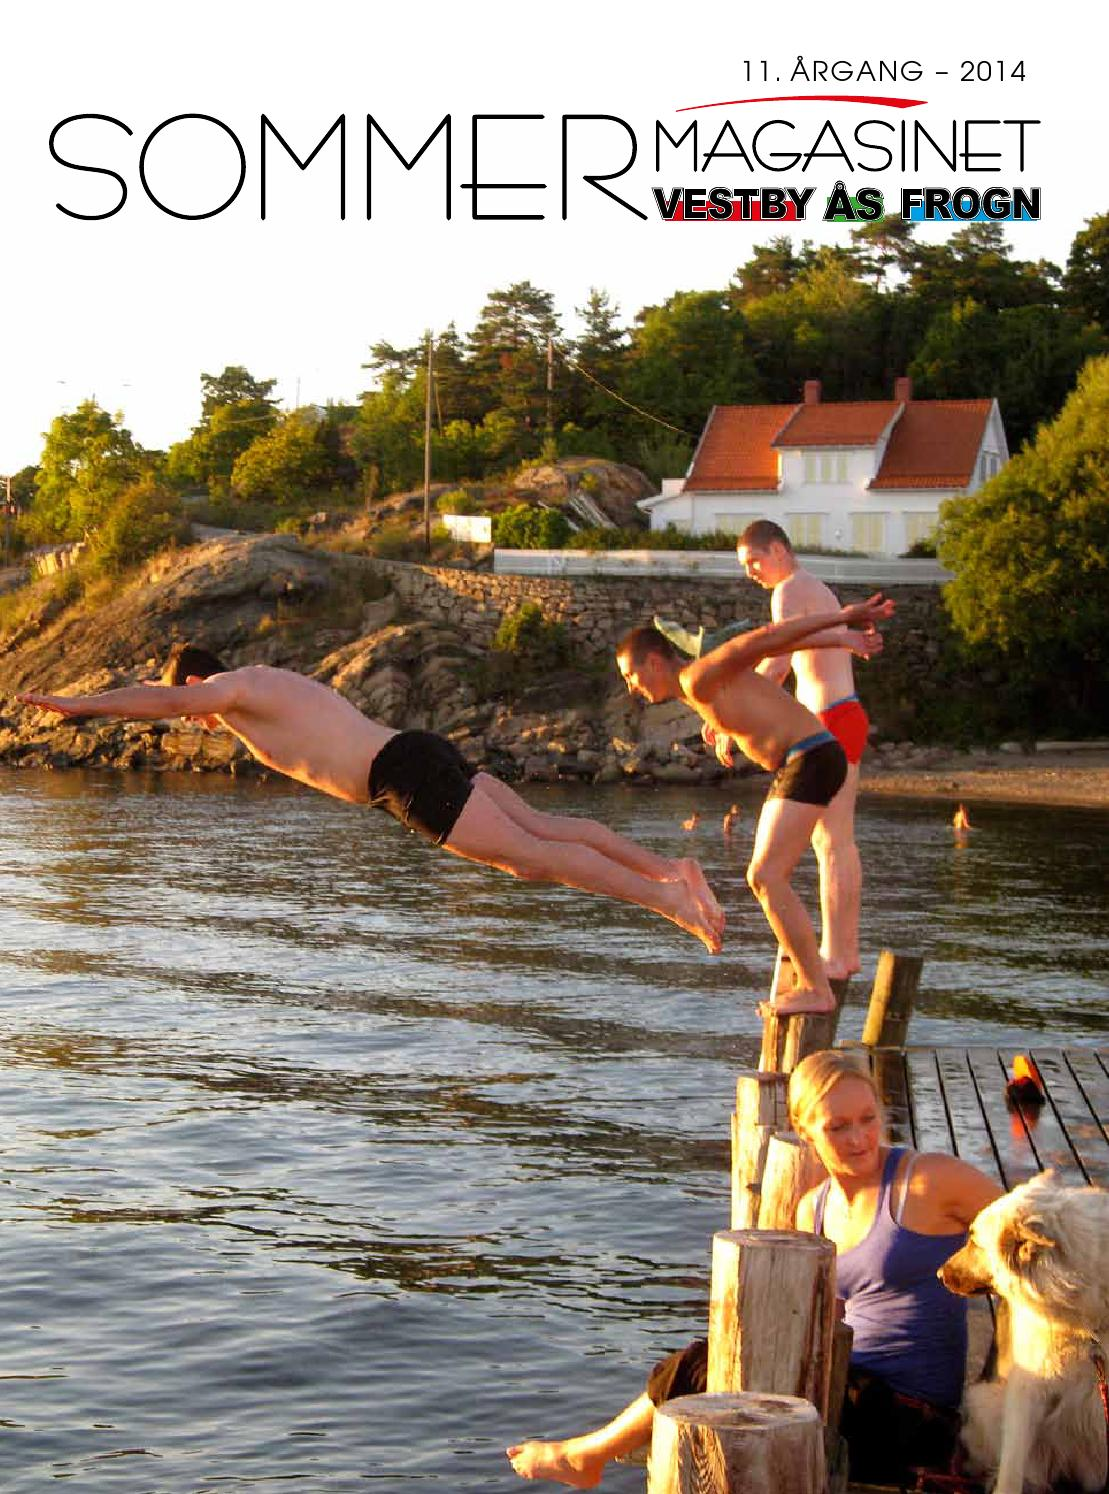 ea9993991 Sommermagasinet 2014 by Mediasenteret AS - issuu